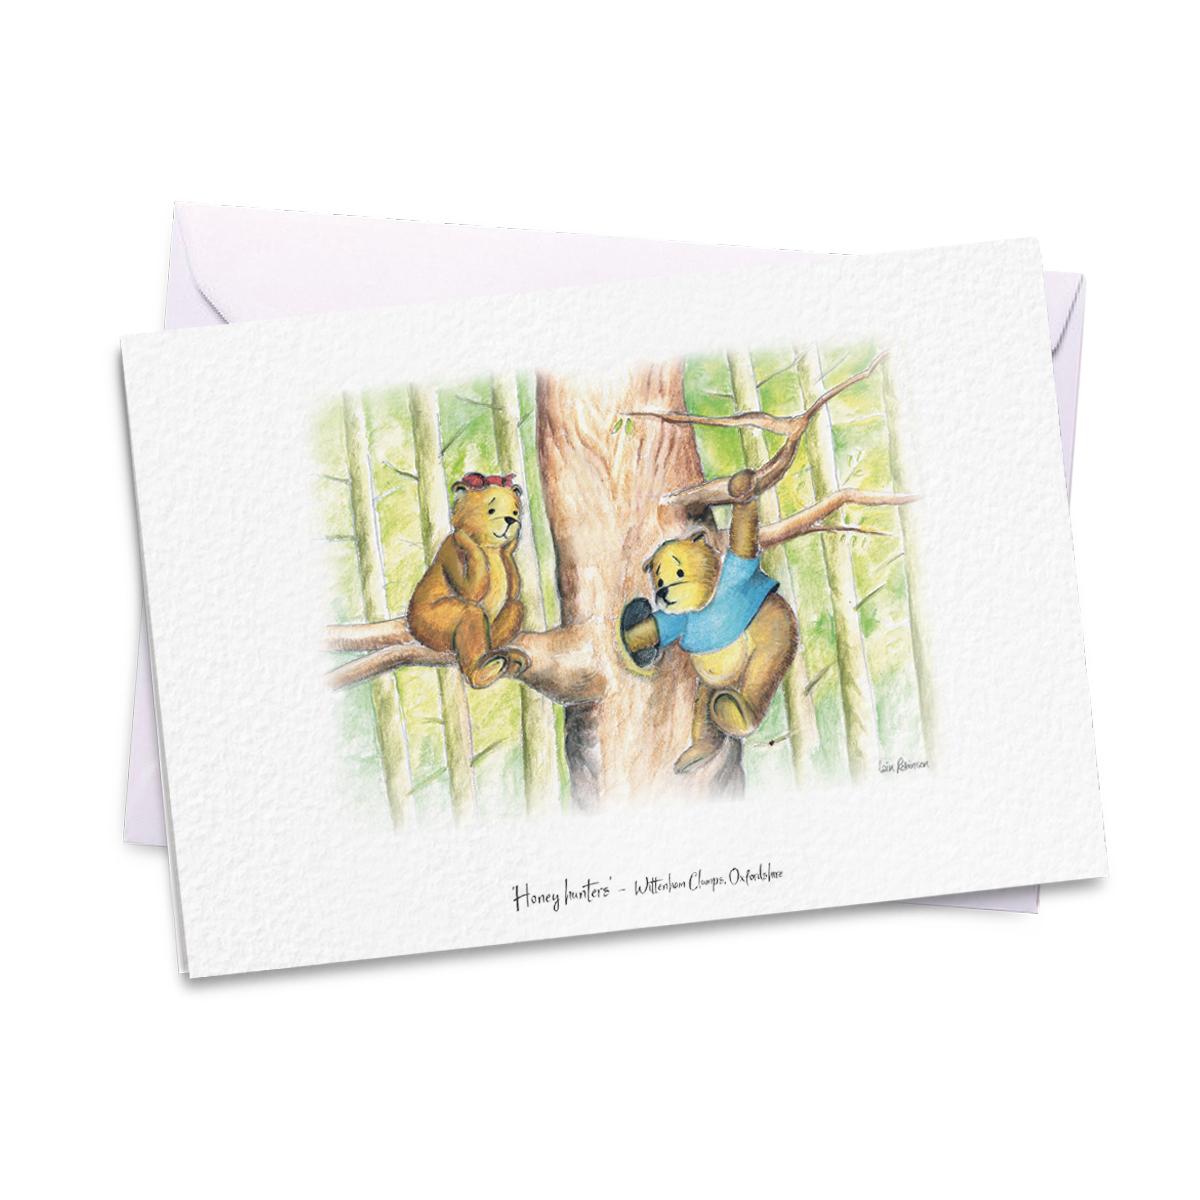 Card preview_Honeyhunters.jpg